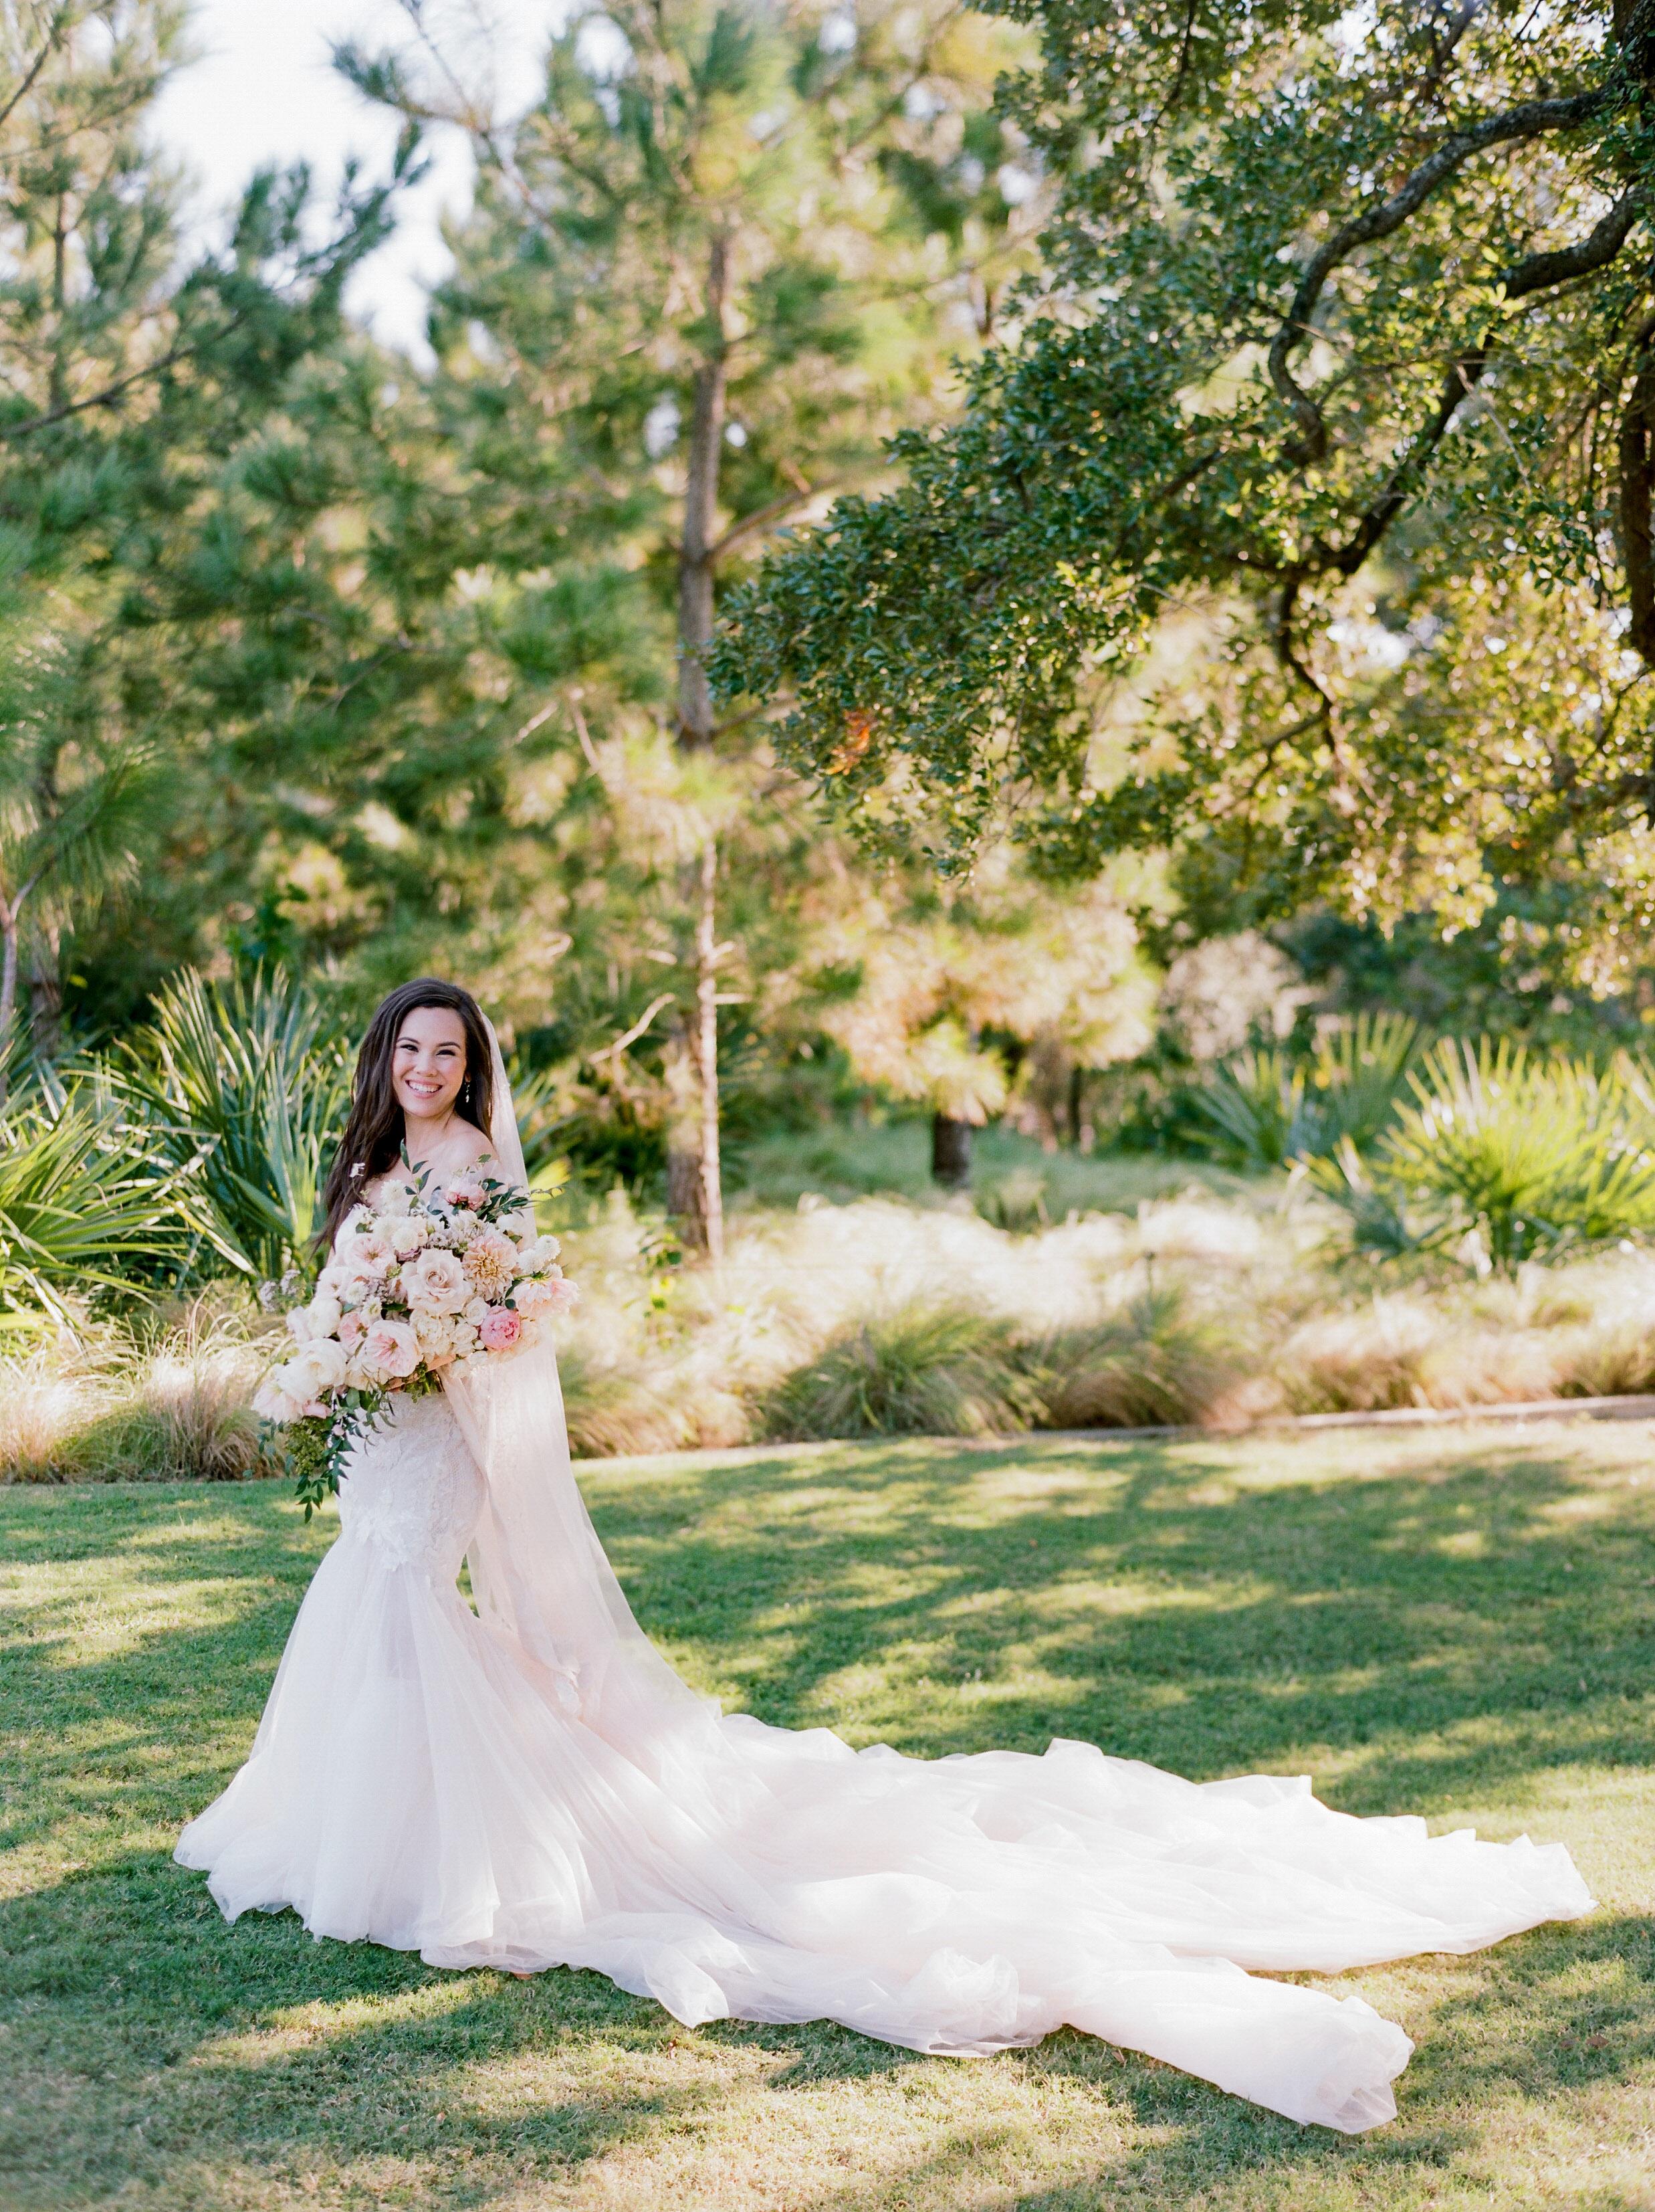 Martha-Stewart-Wedding-Dana-Fernandez-Photography-Josh-Texas-Film-Houston-Wedding-Fine-Art-Photographer-McGovern-Centennial-Gardens-Top-Best-143.jpg